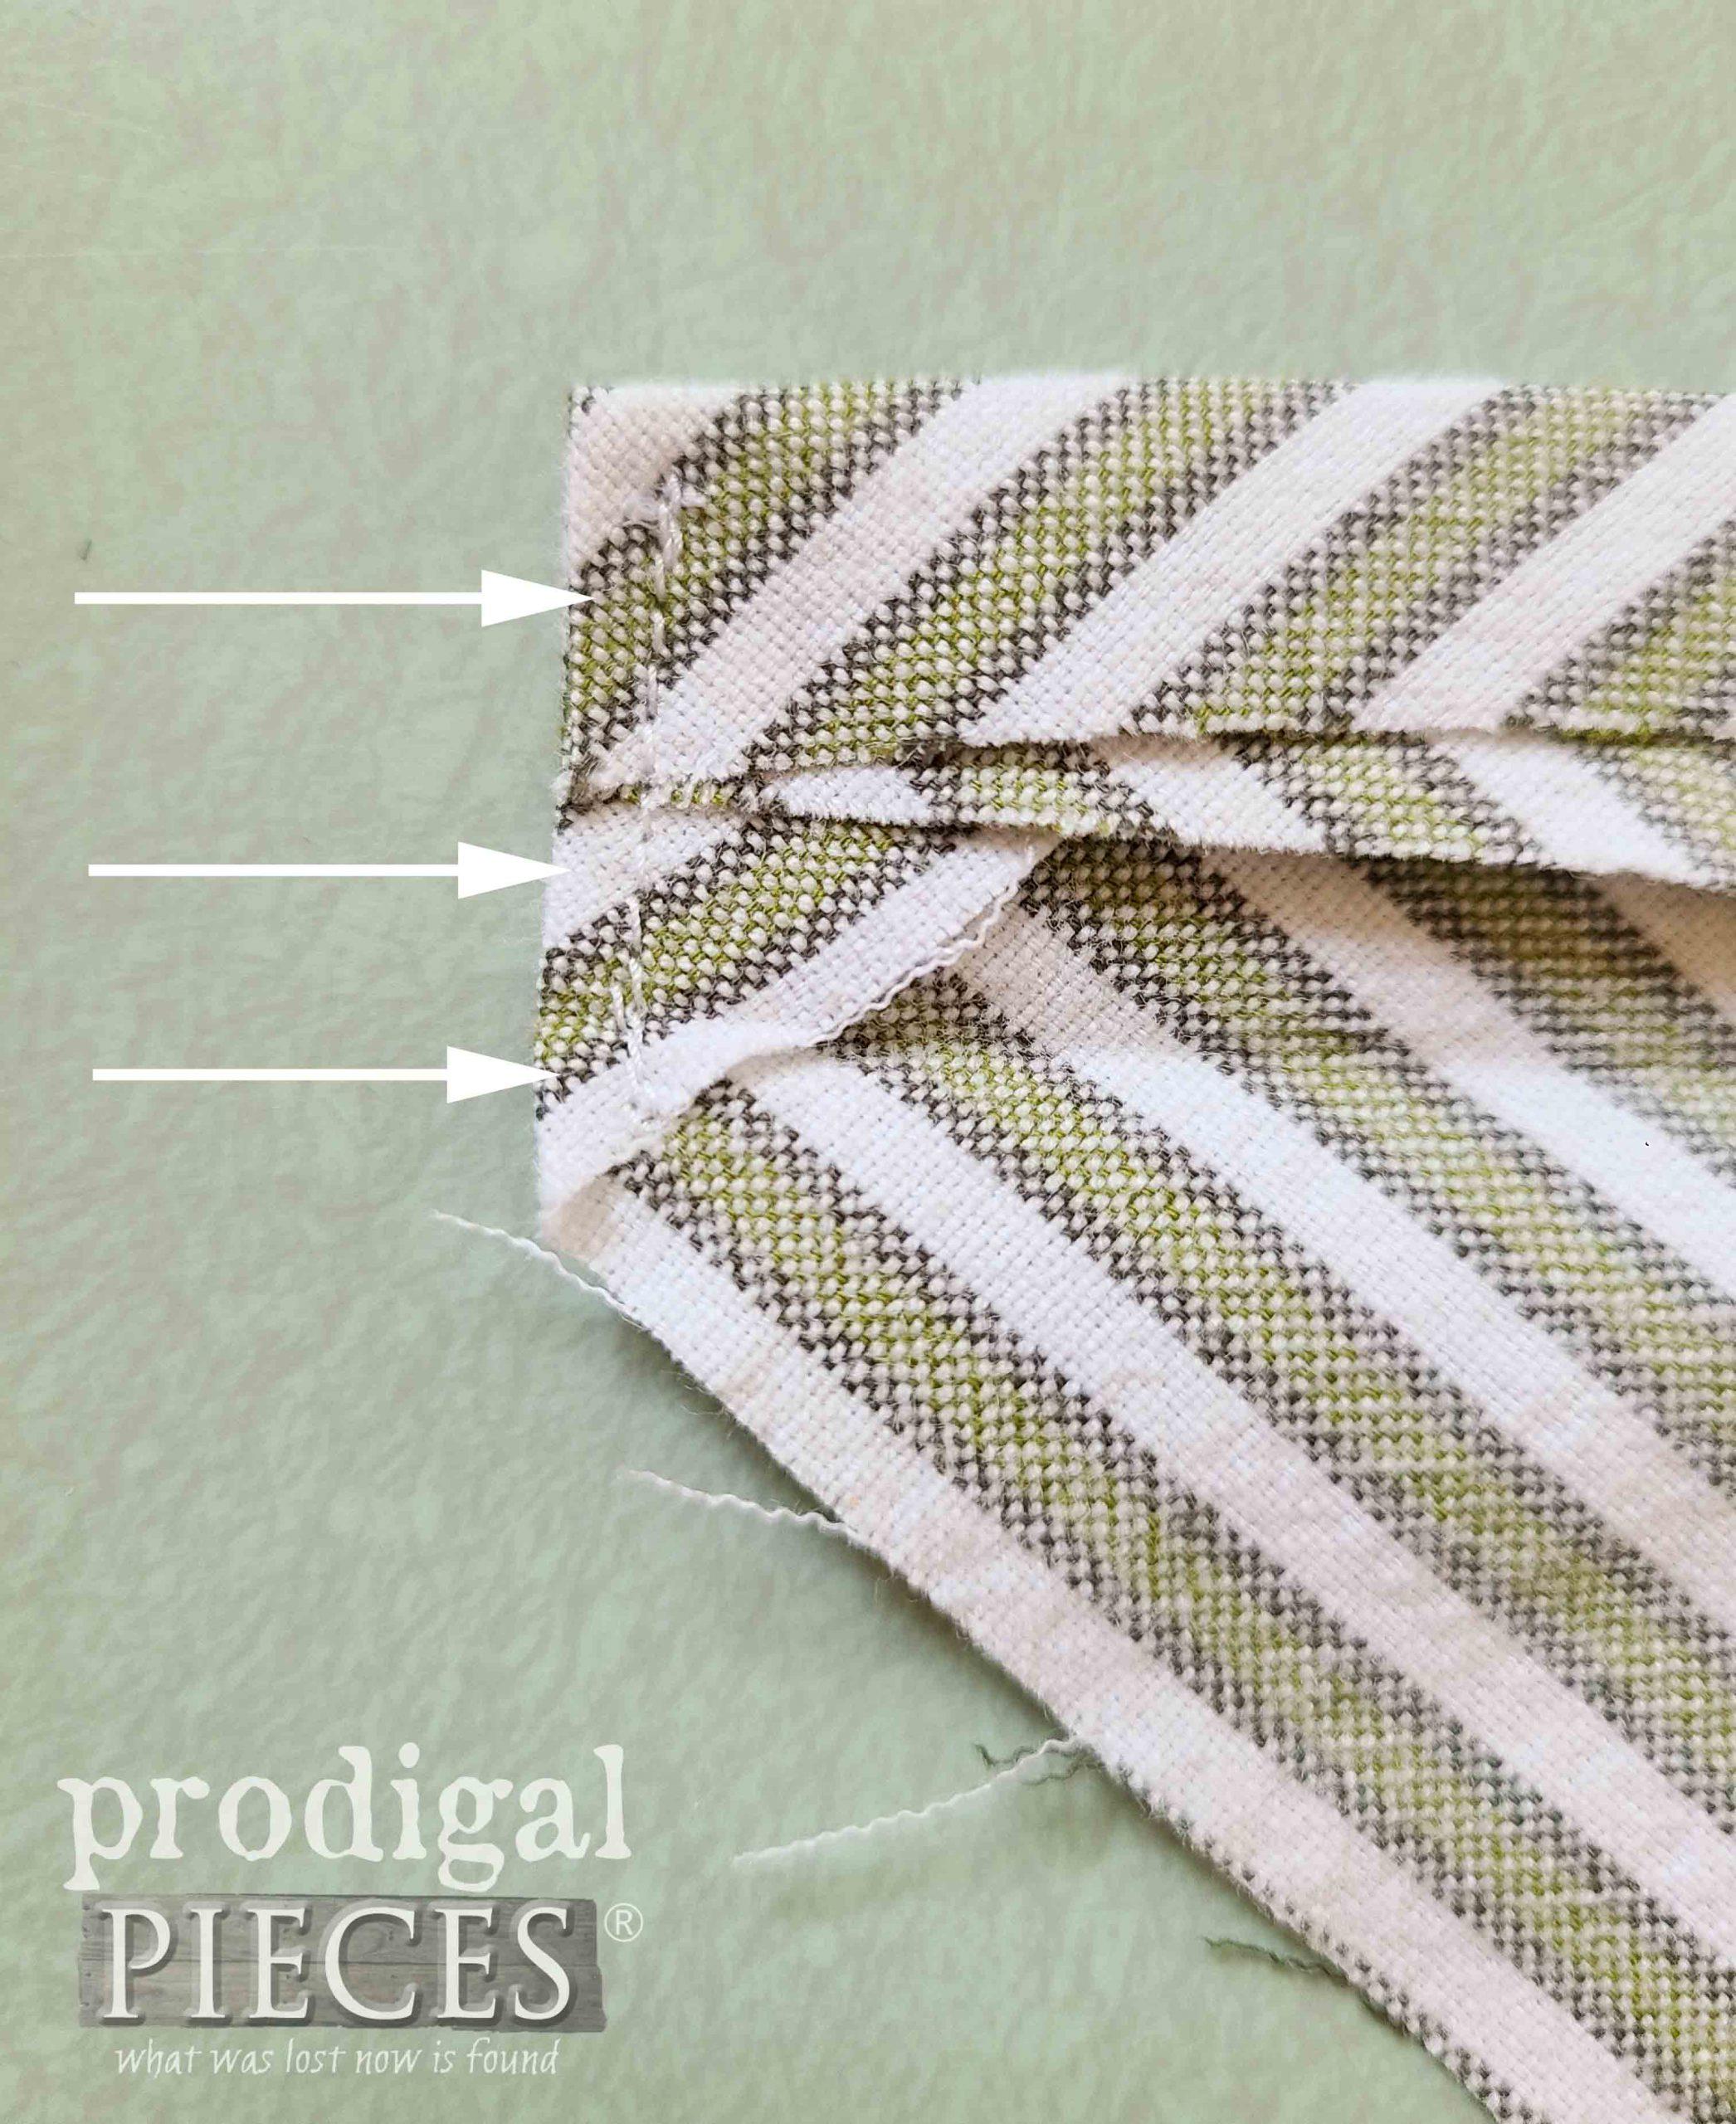 Edge Seam on Cord Casing for Reusable Shopping Bag   prodigalpieces.com